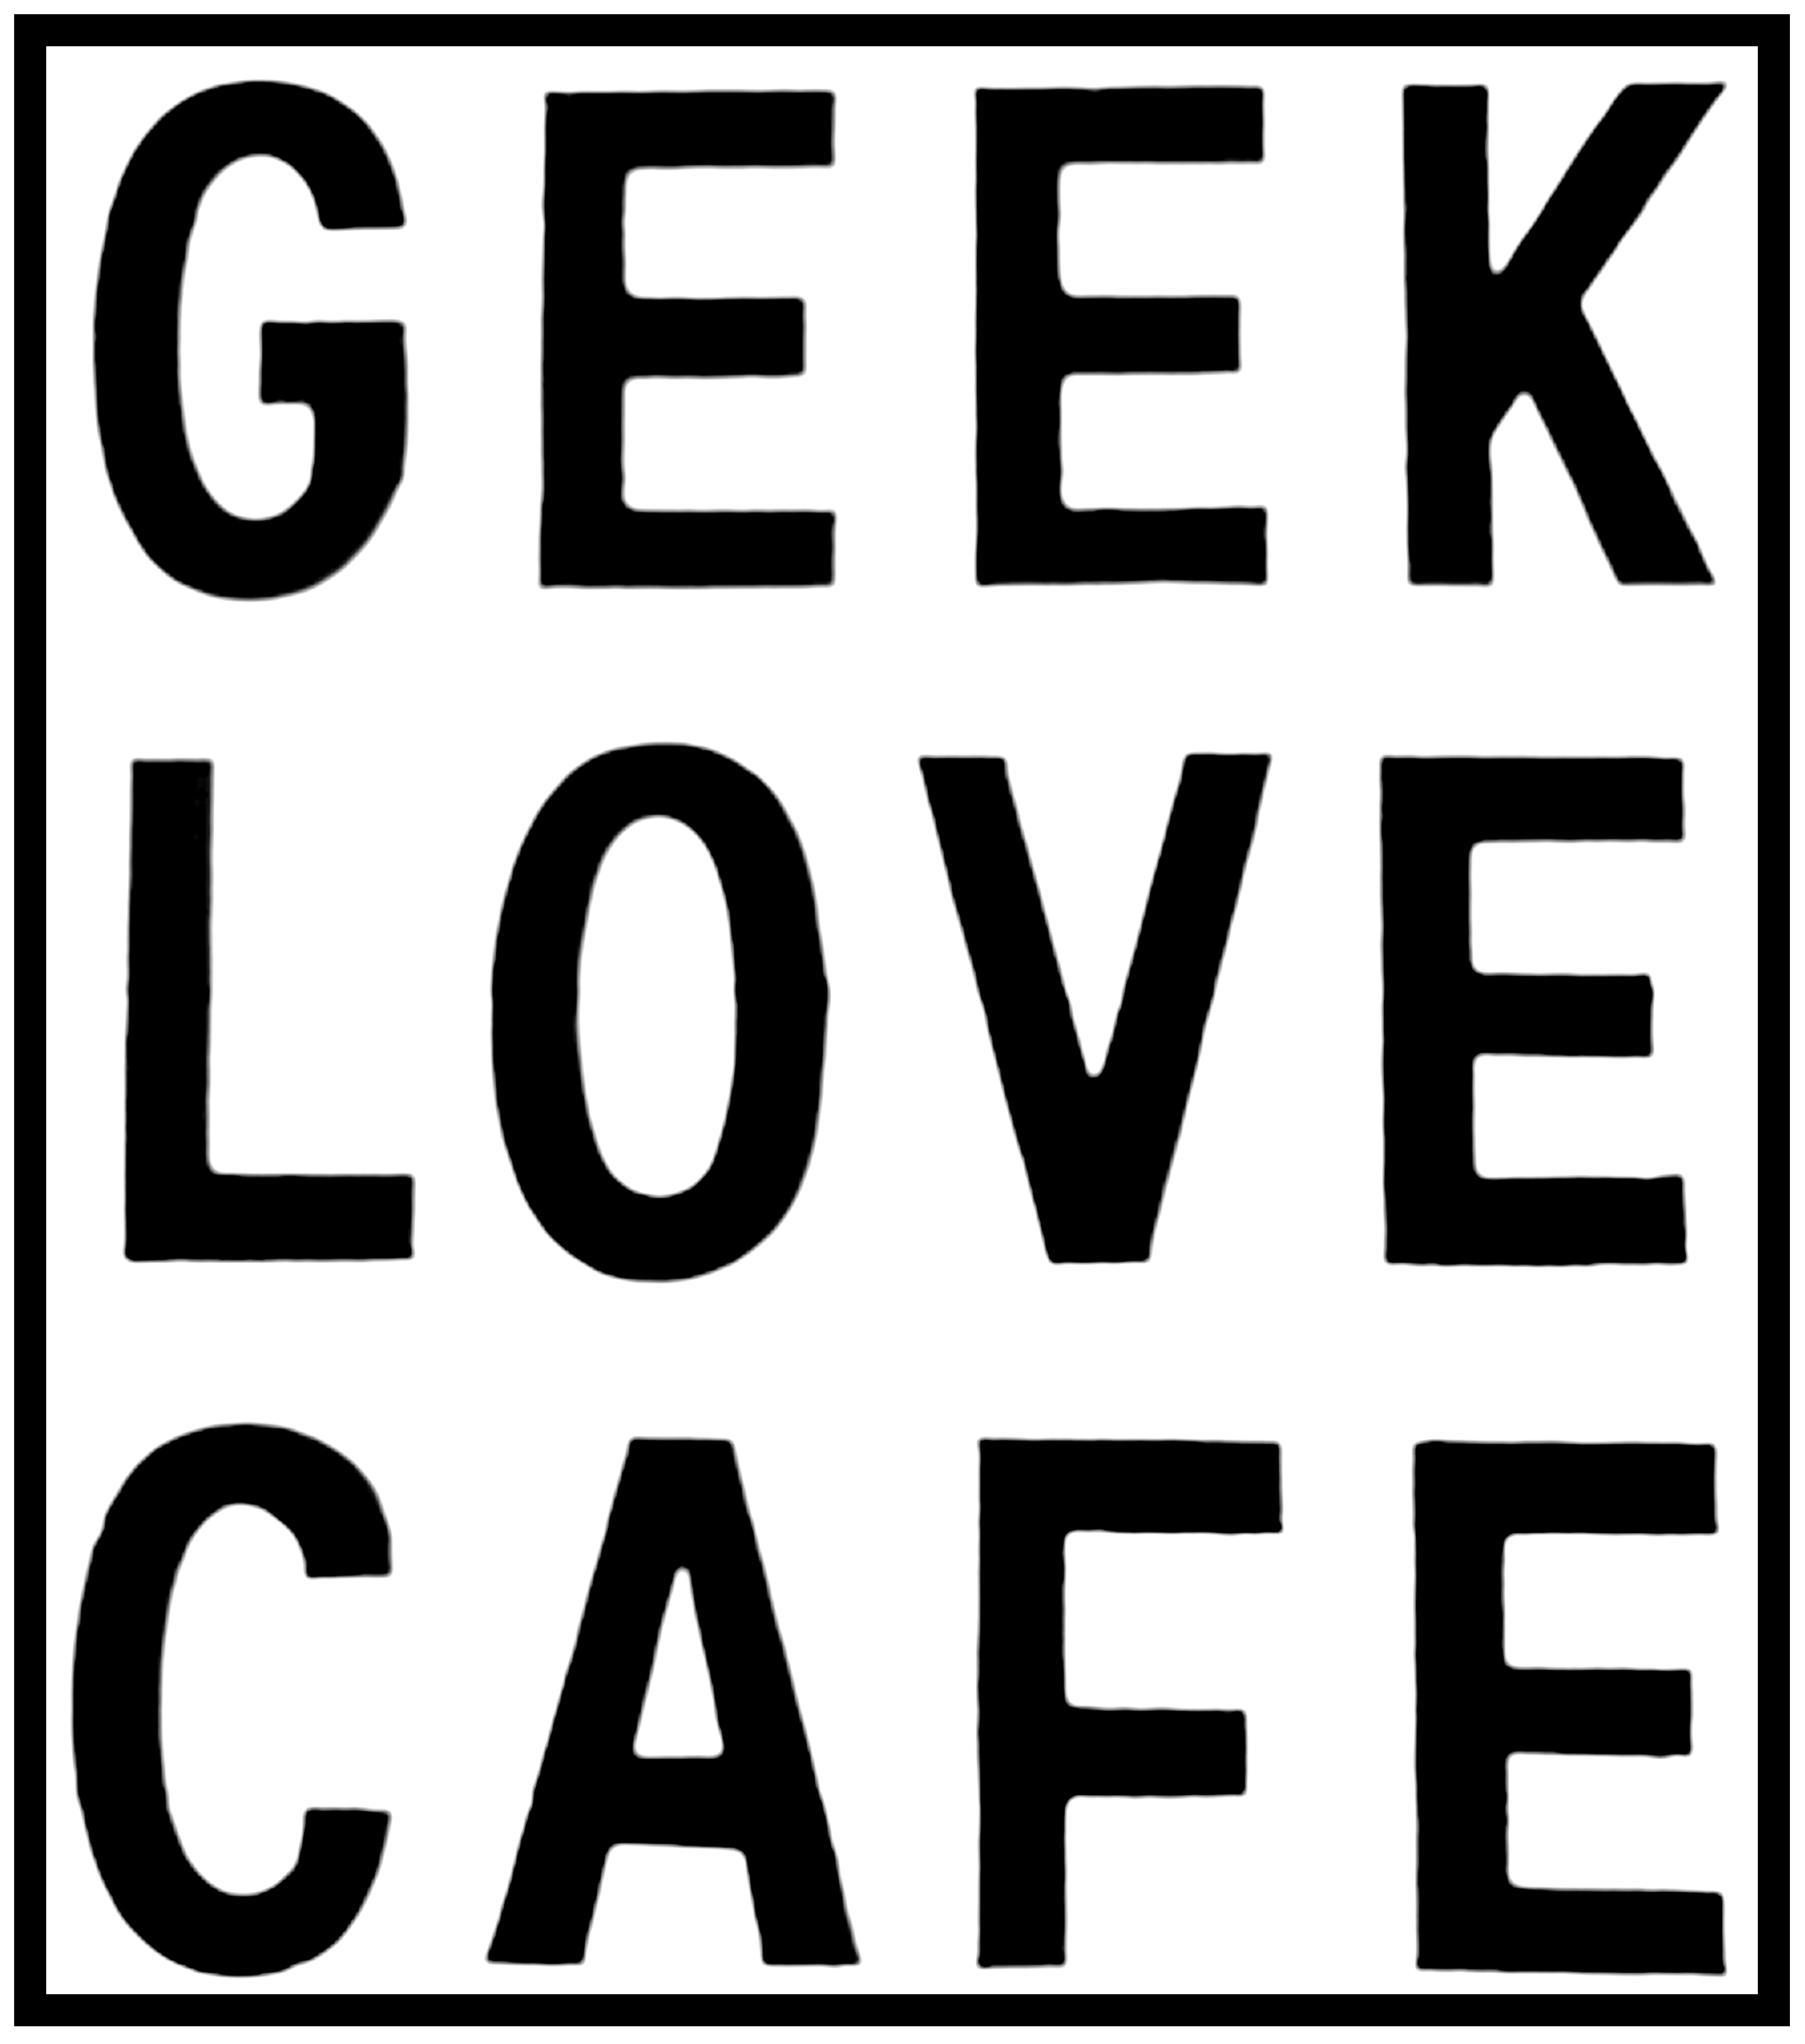 GLC logo.png